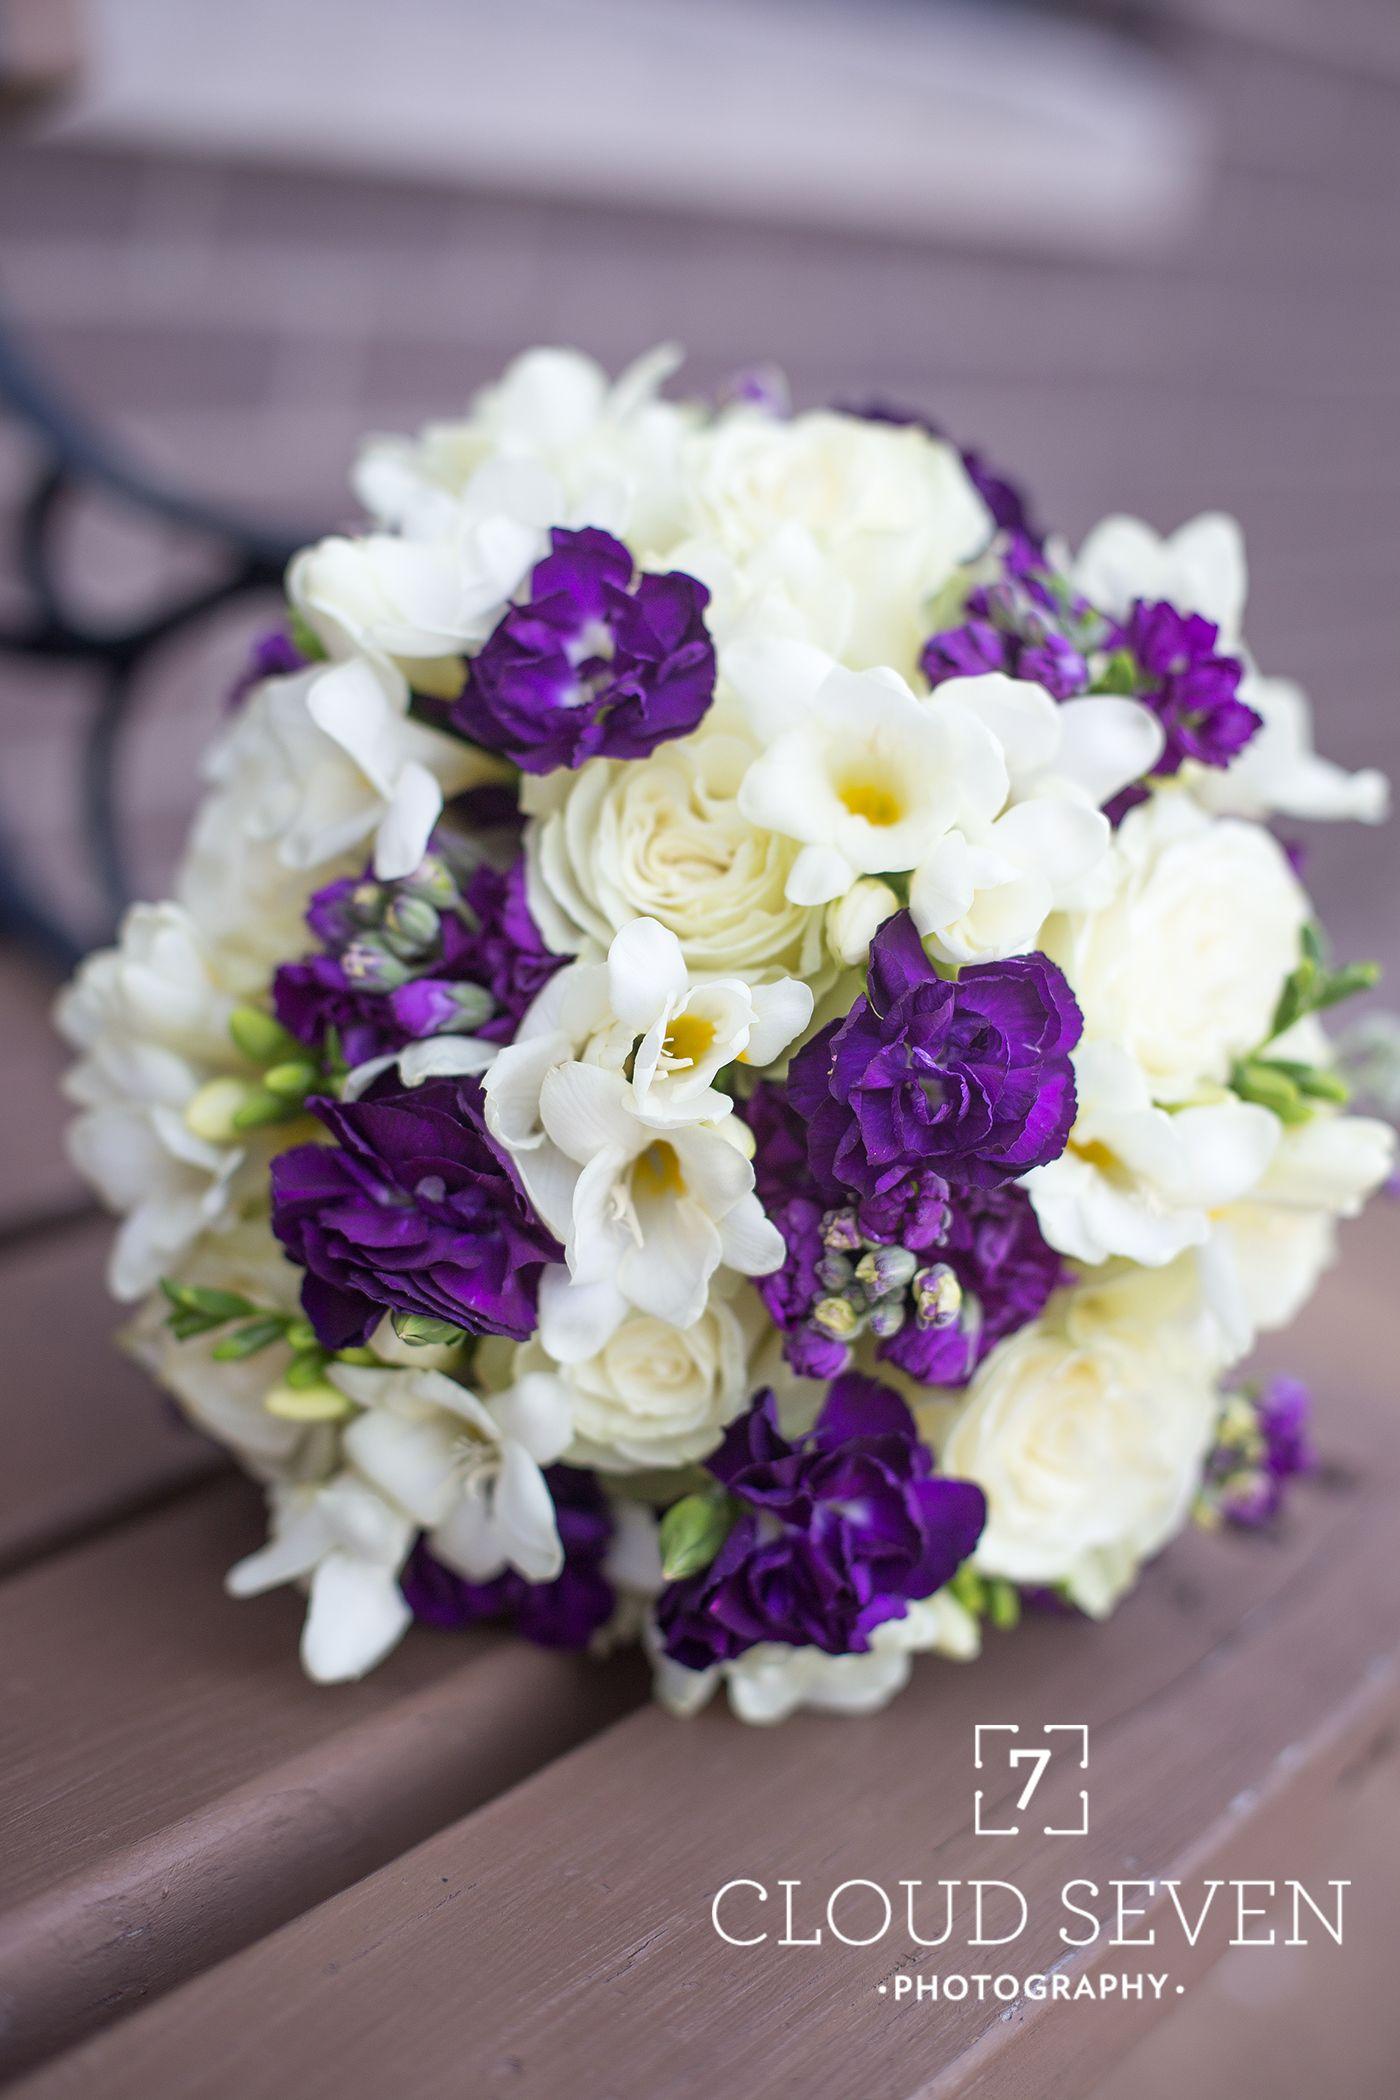 Wedding flowers bridal bouquet purple wedding flowers wedding wedding flowers bridal bouquet purple wedding flowers izmirmasajfo